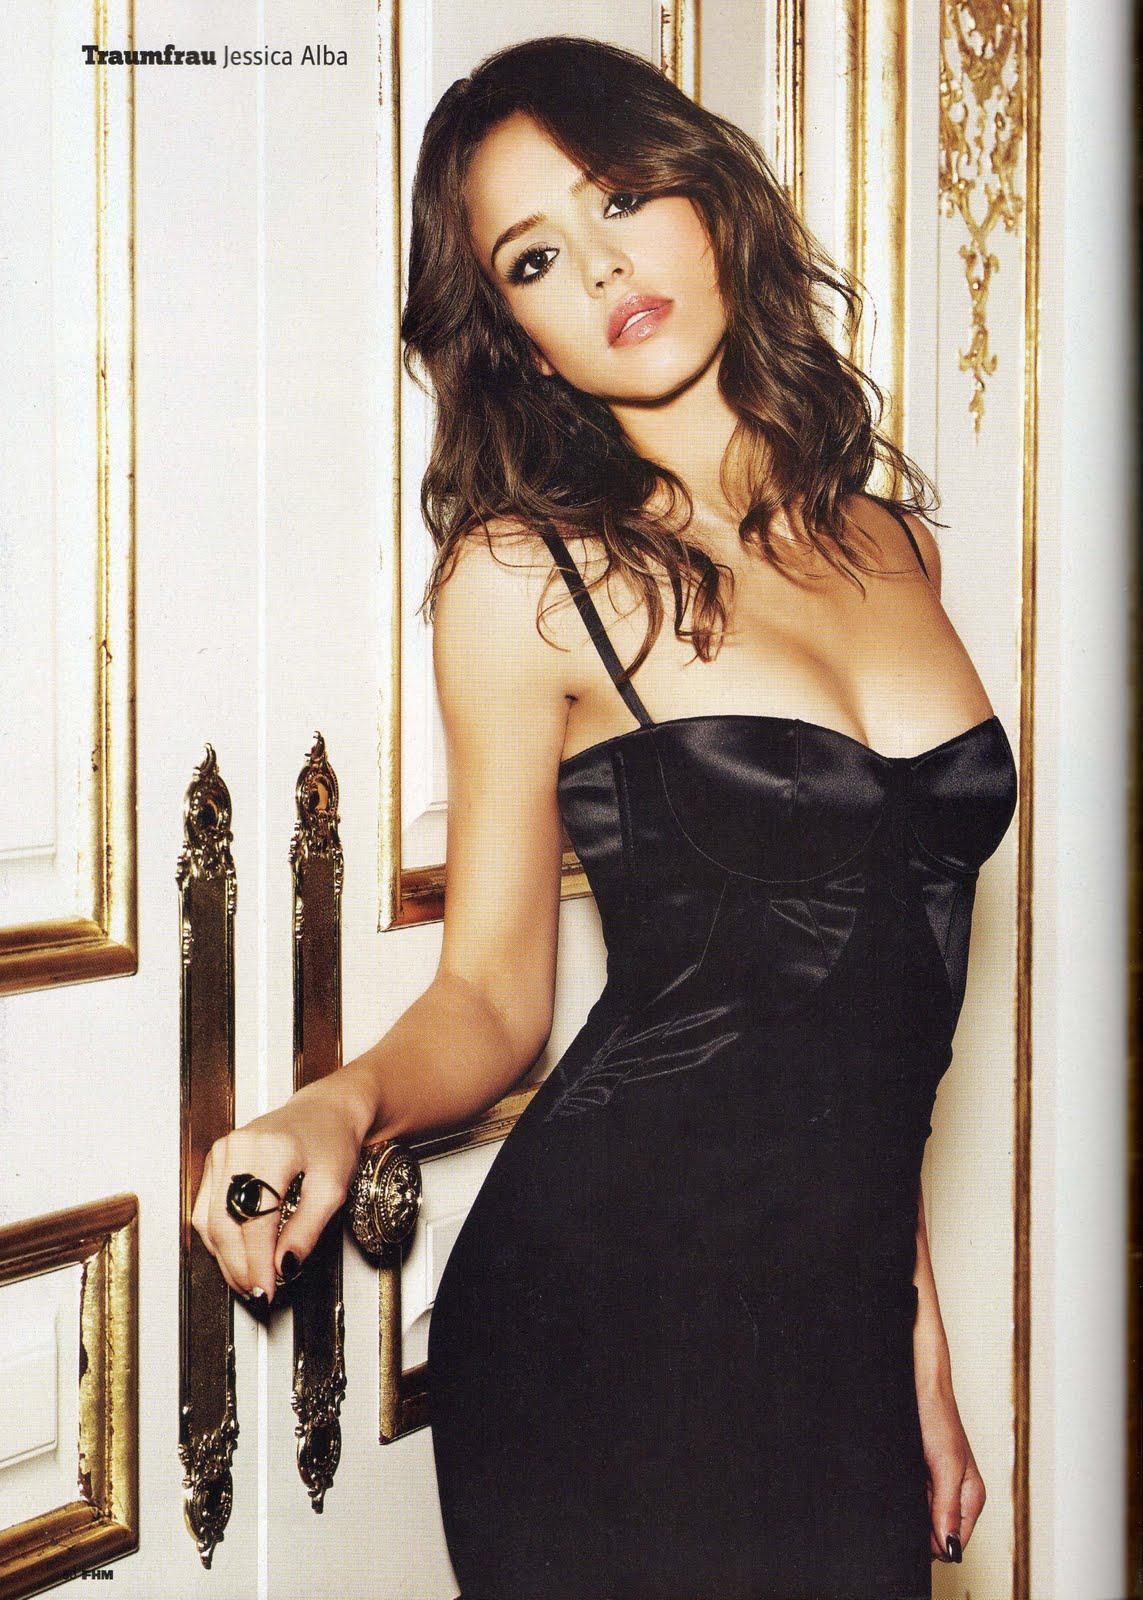 Emmy Rossum Nude Photos